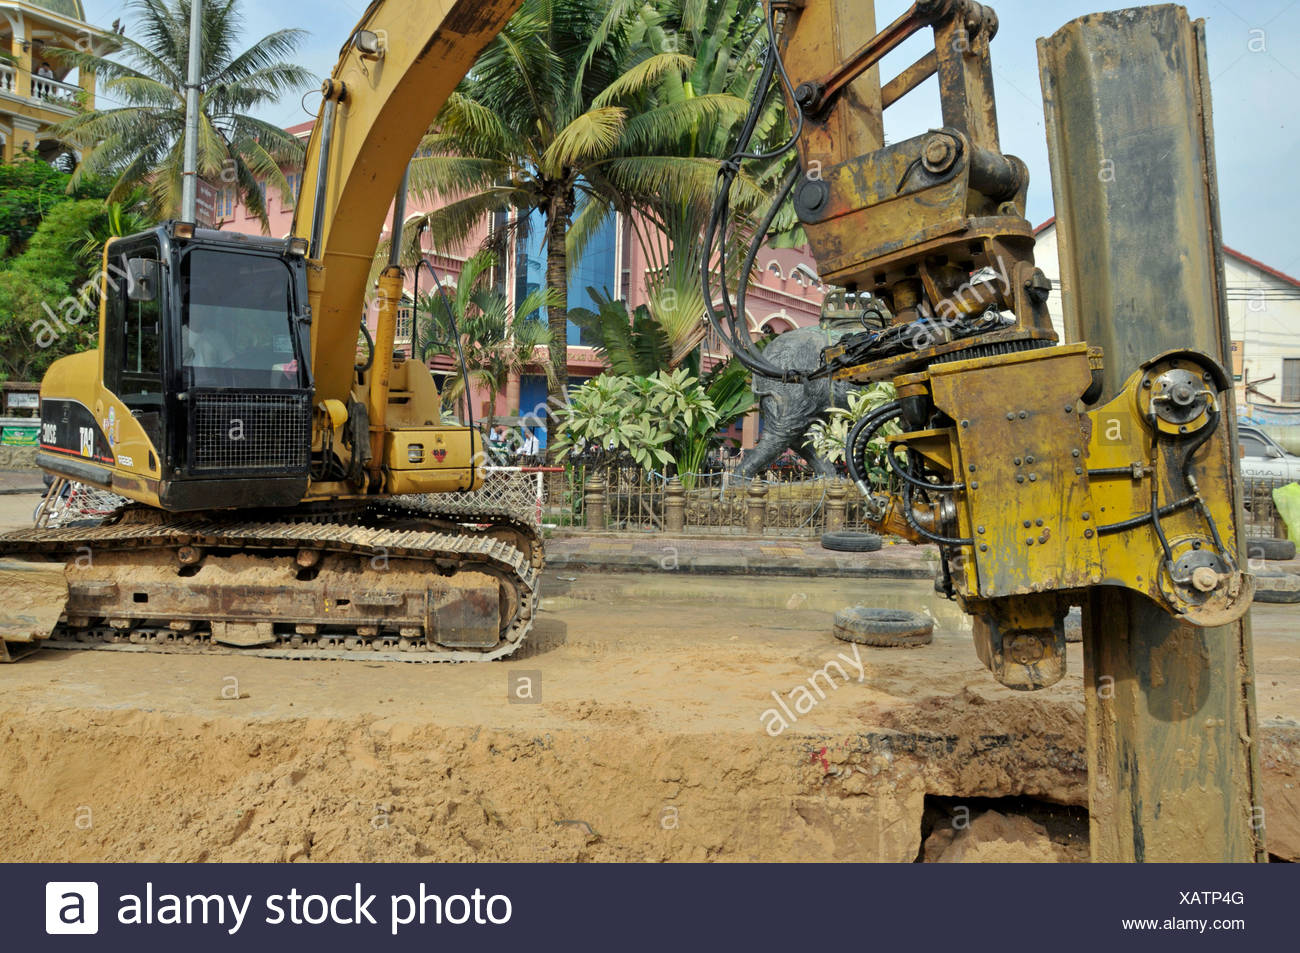 Working device professional life Asia excavator Cambodia Mekong region metal wall metal walls Siem Reap excavation pit - Stock Image